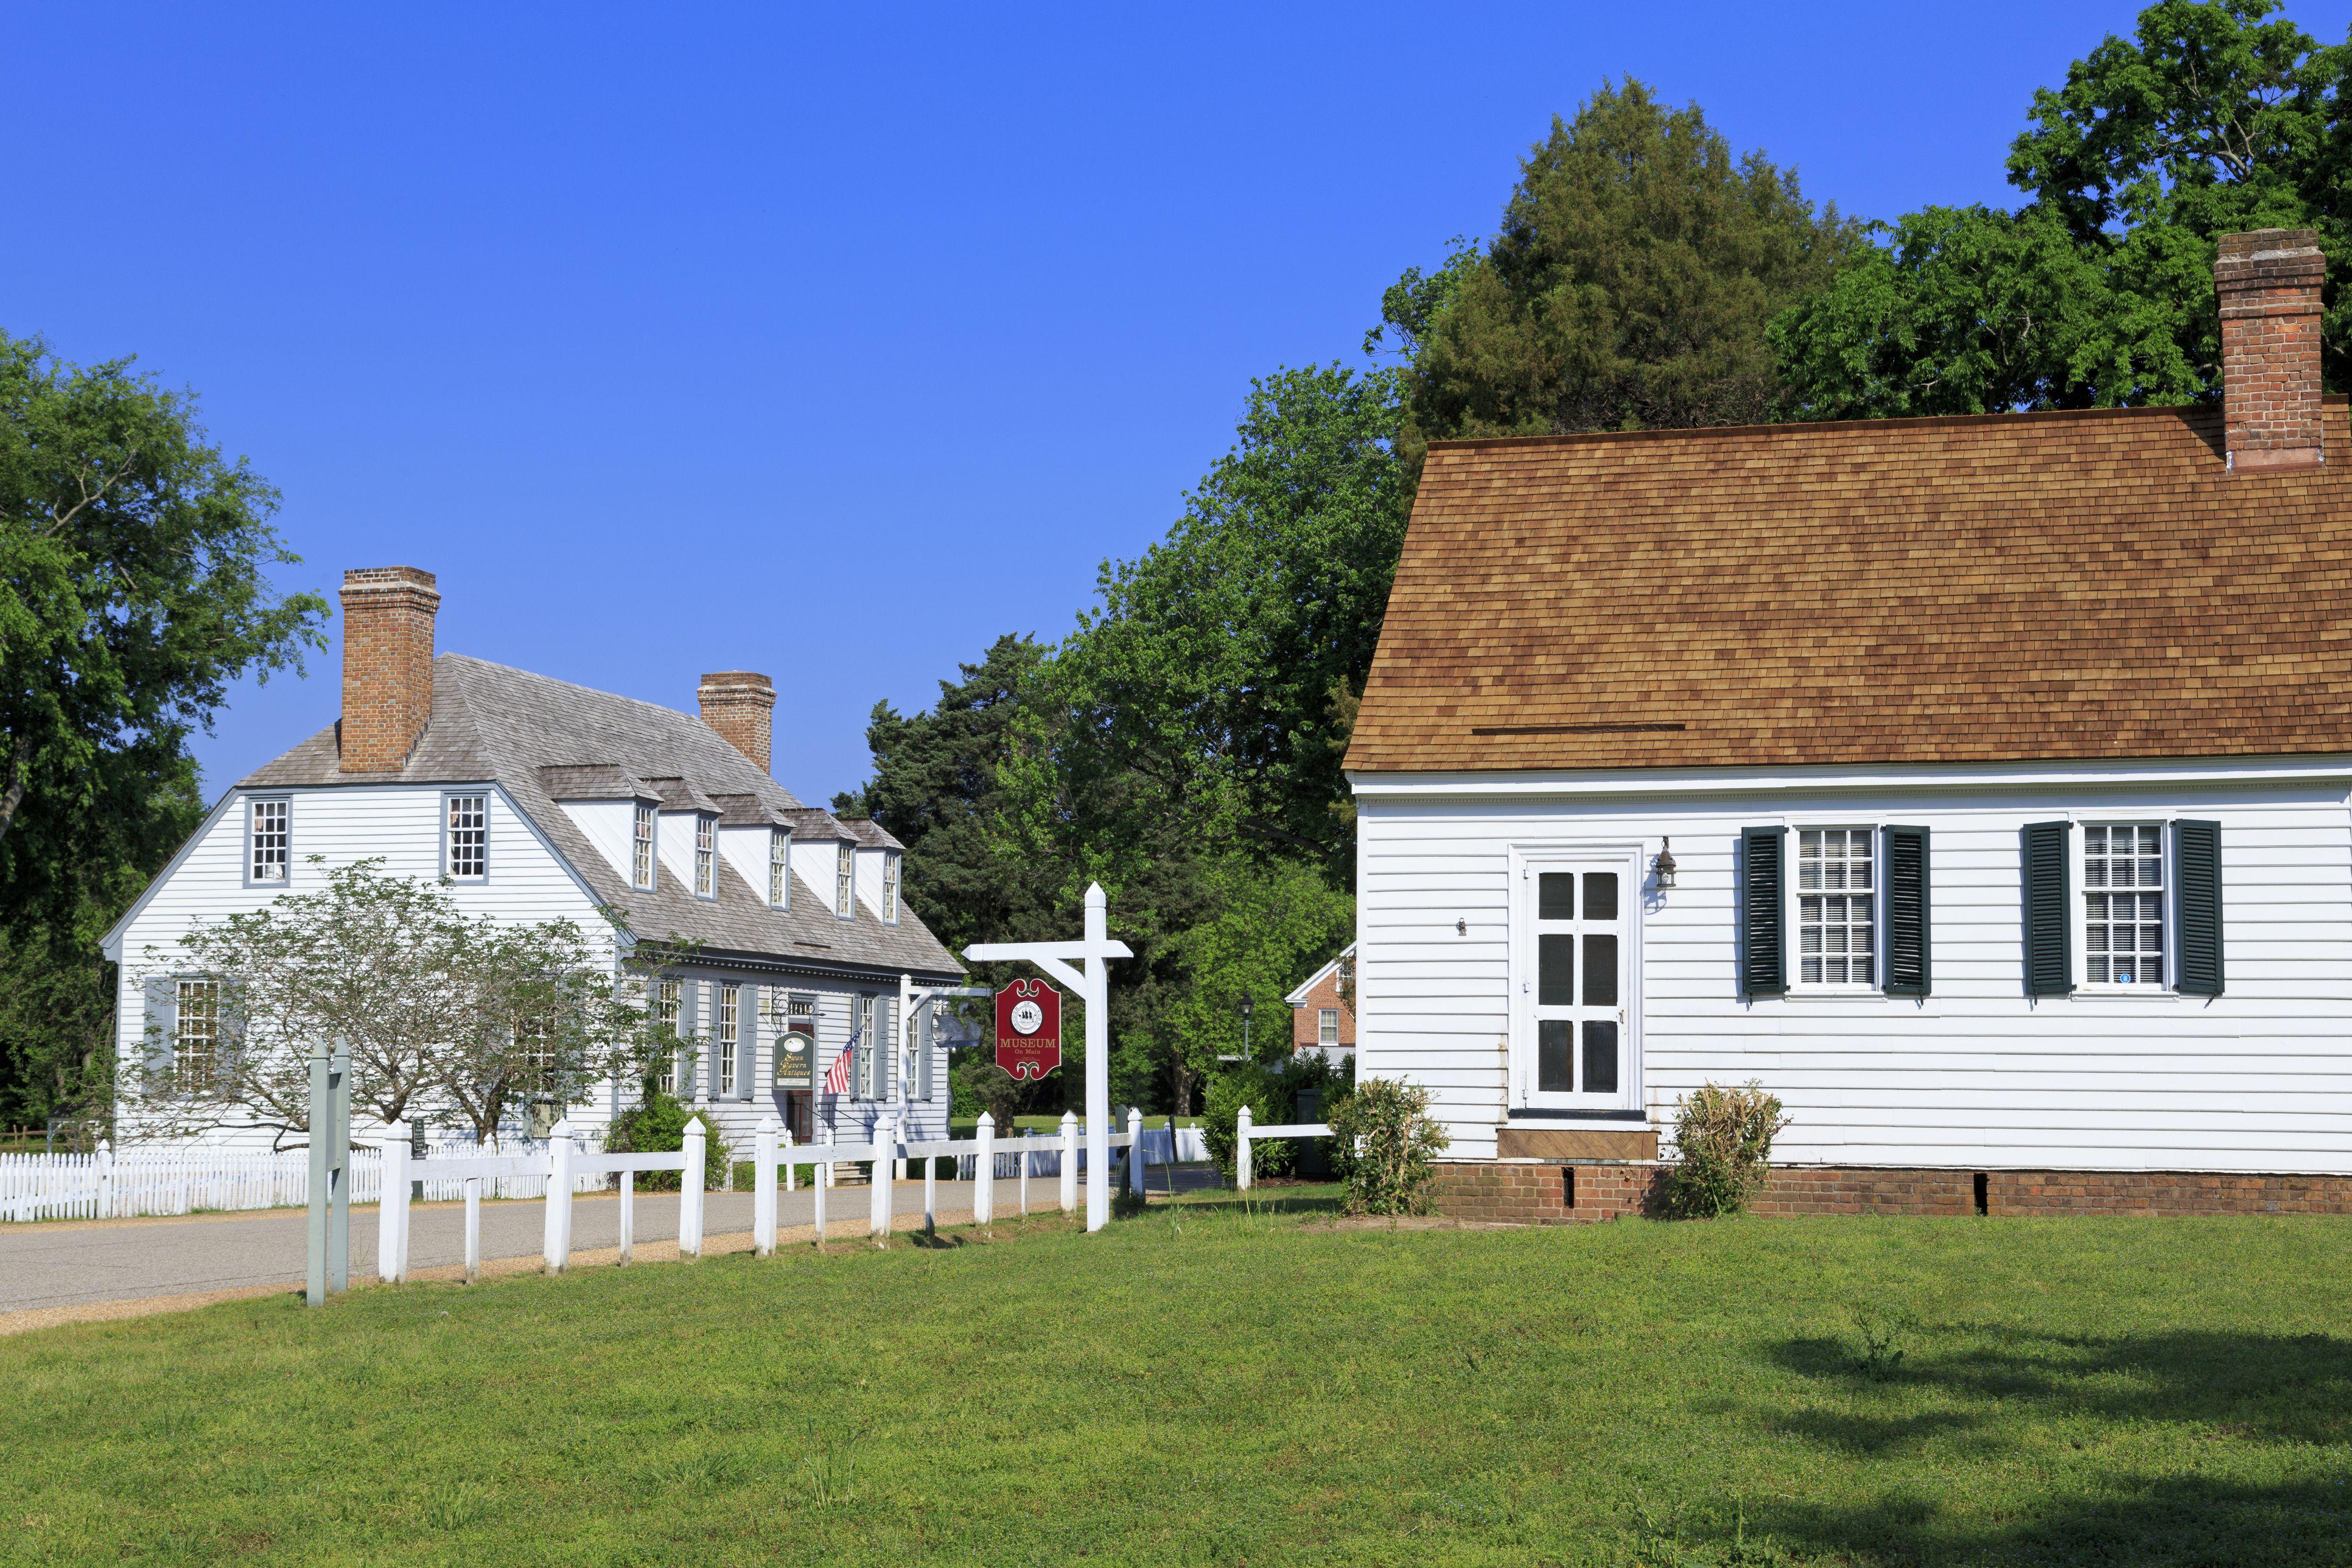 Historic Swan Tavern & Museum, Yorktown, Virginia